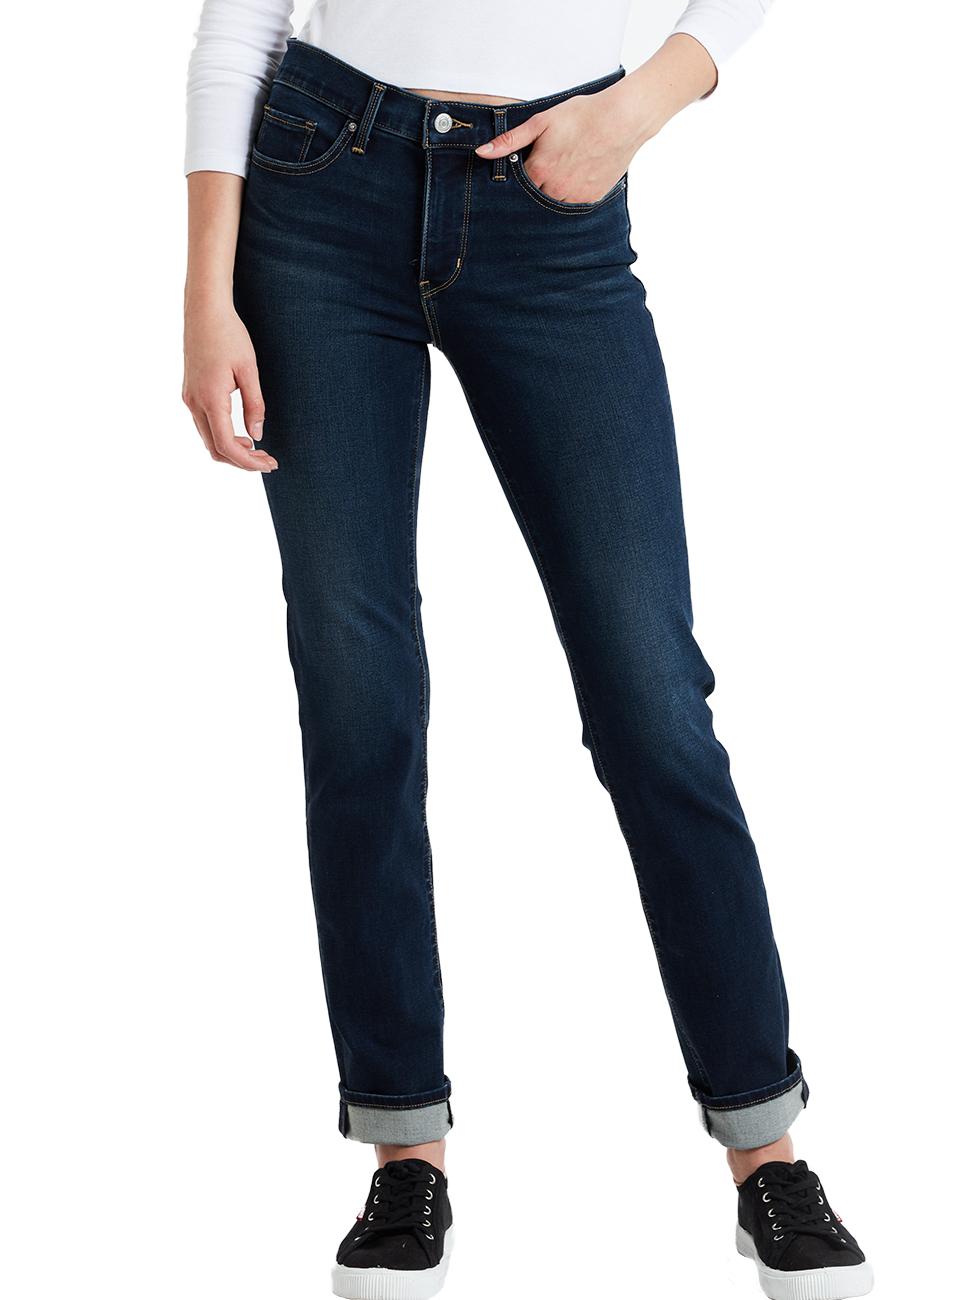 super popular 7a542 9f8d8 Levis® Damen Jeans 312 Shaping Slim Fit - Blau - Date with Destiny